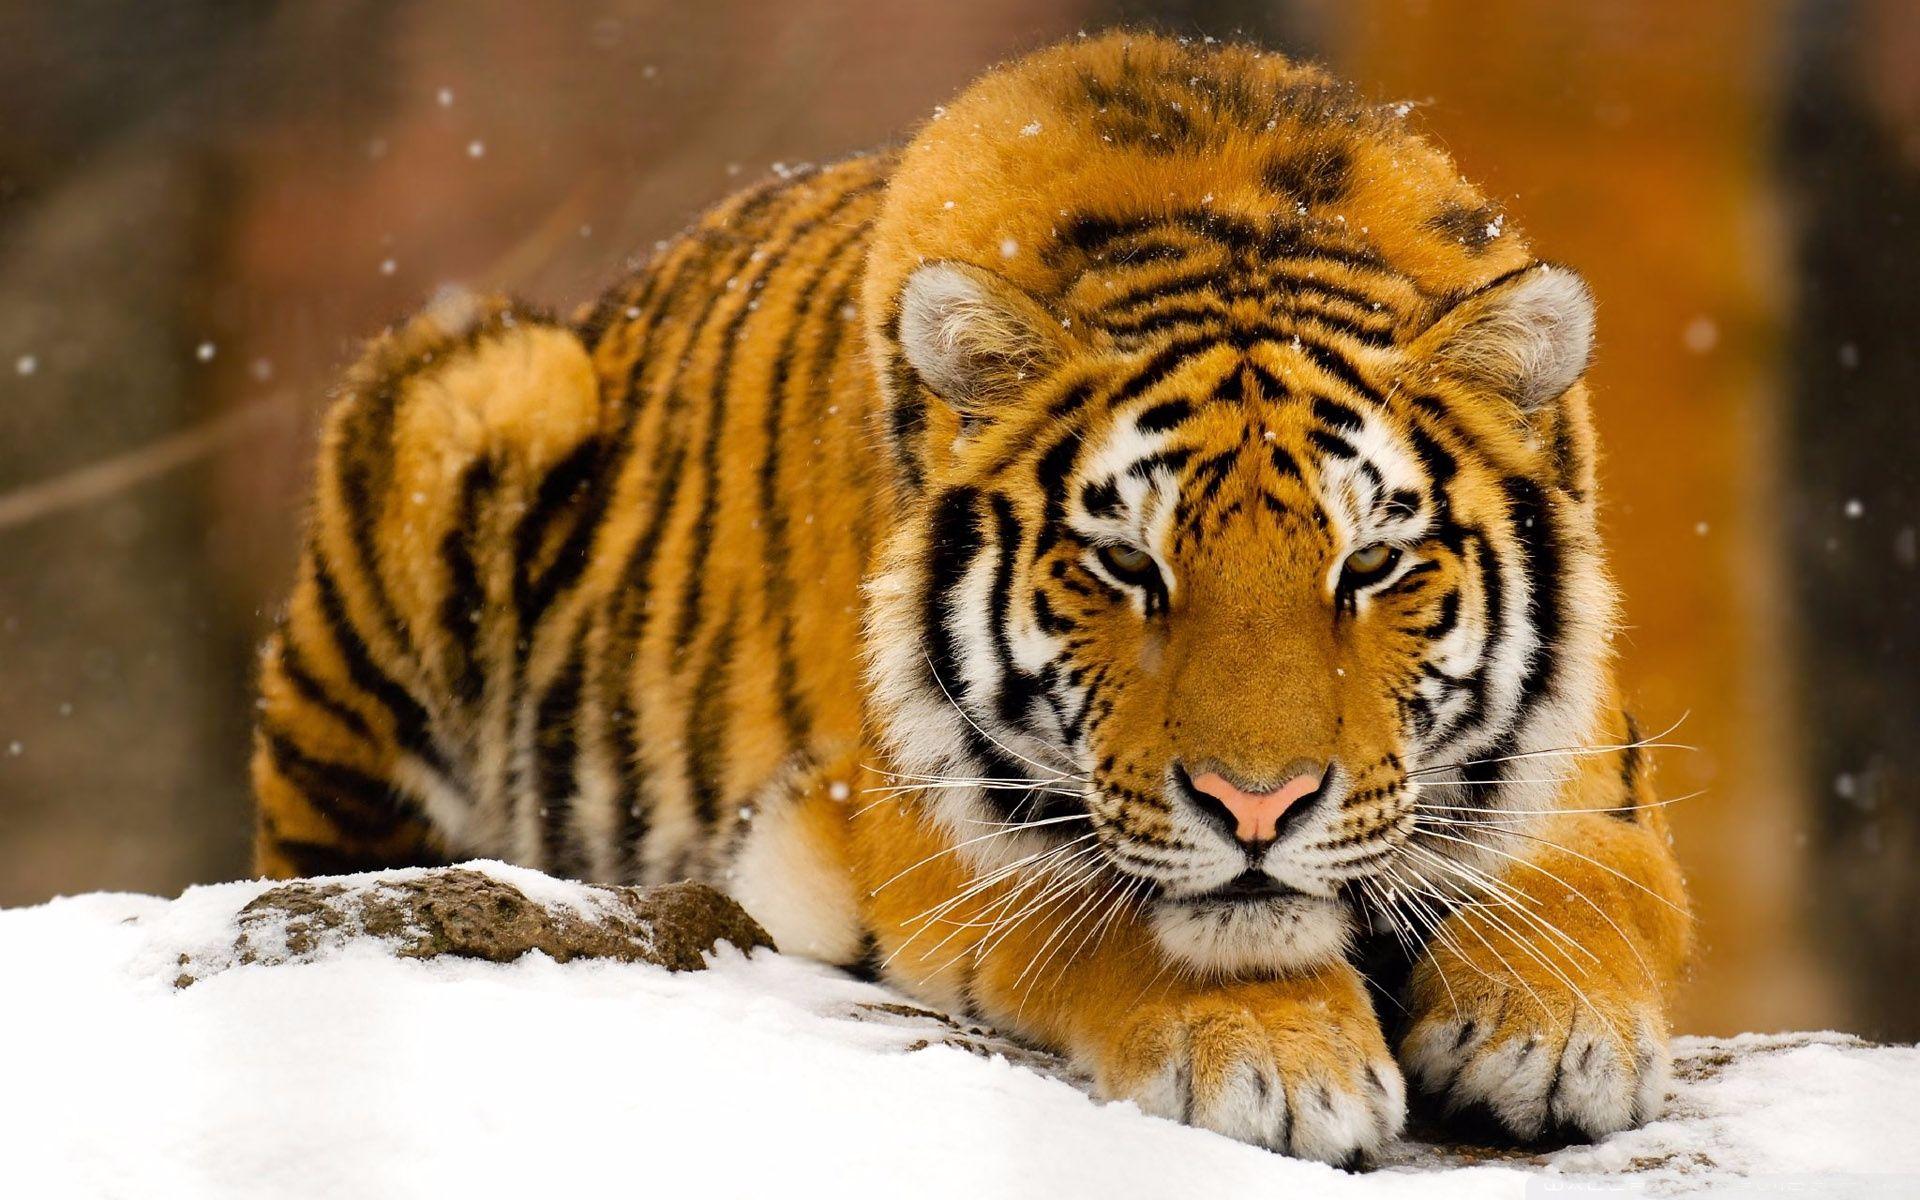 tiger)是世界上最大的猫科动物